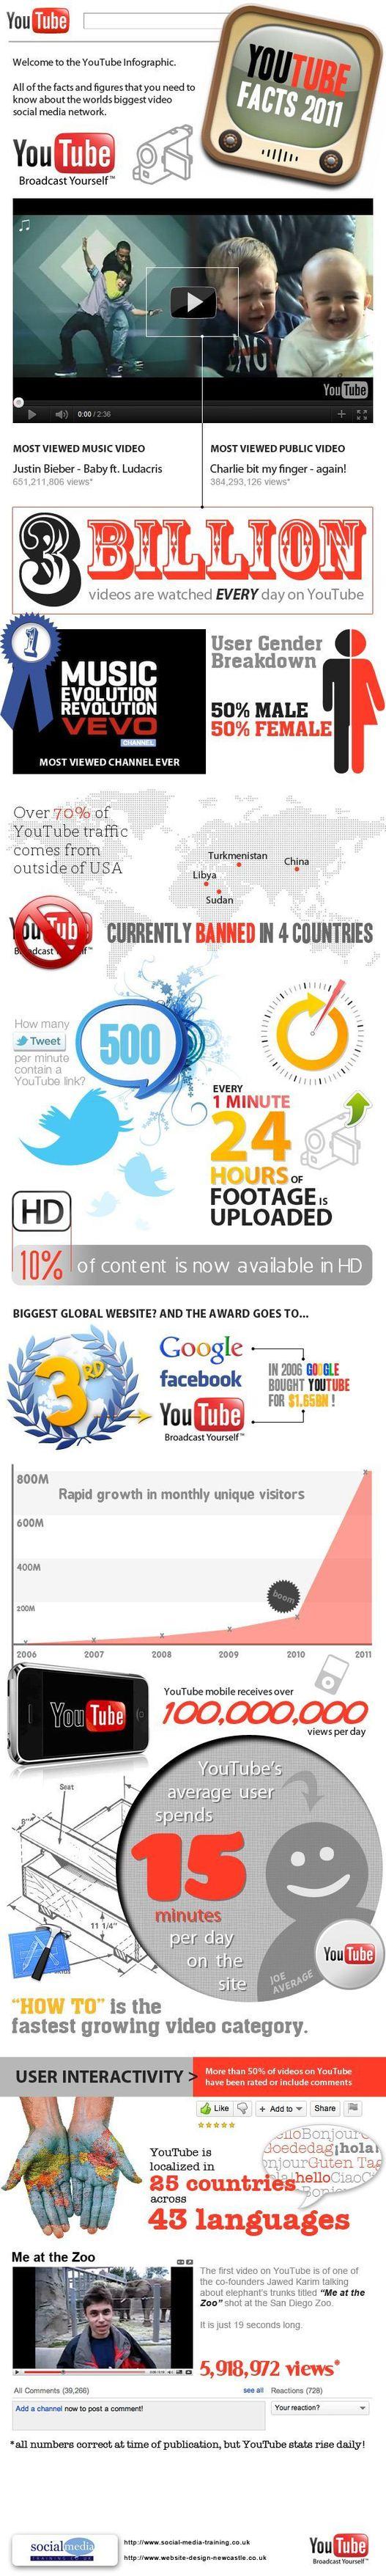 Youtube - Les stats 2011 en 1 image